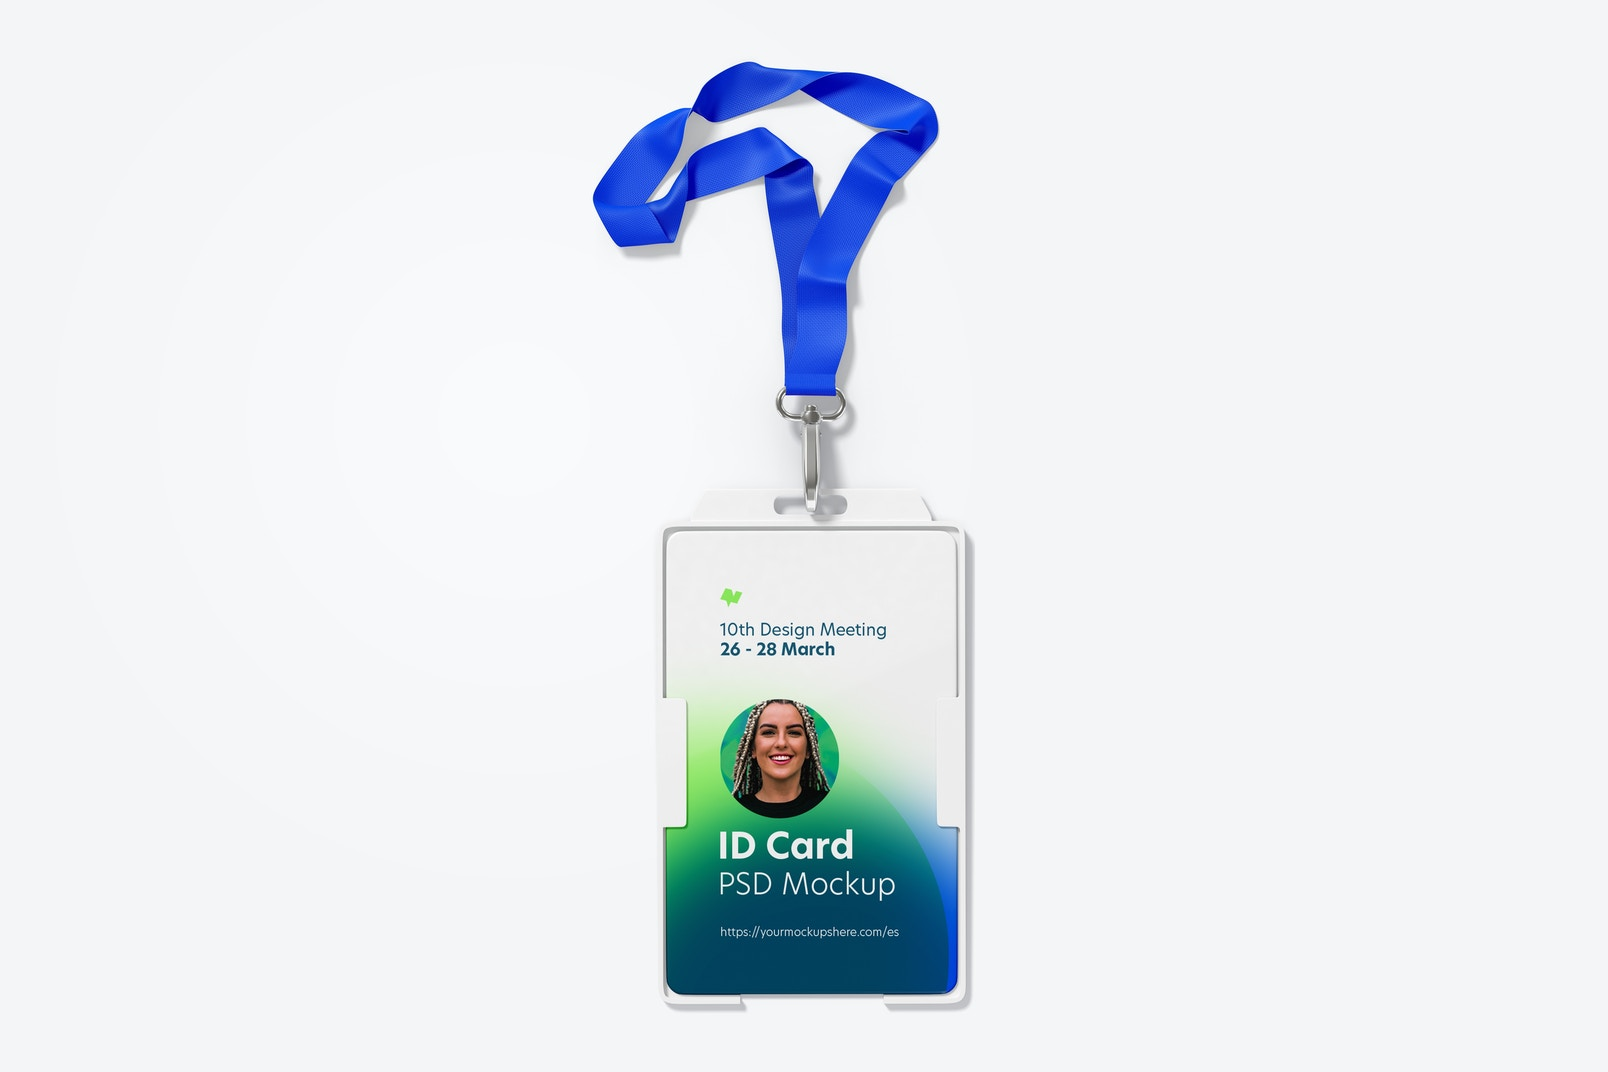 ID Card with Lanyard and Swivel Hook Mockup